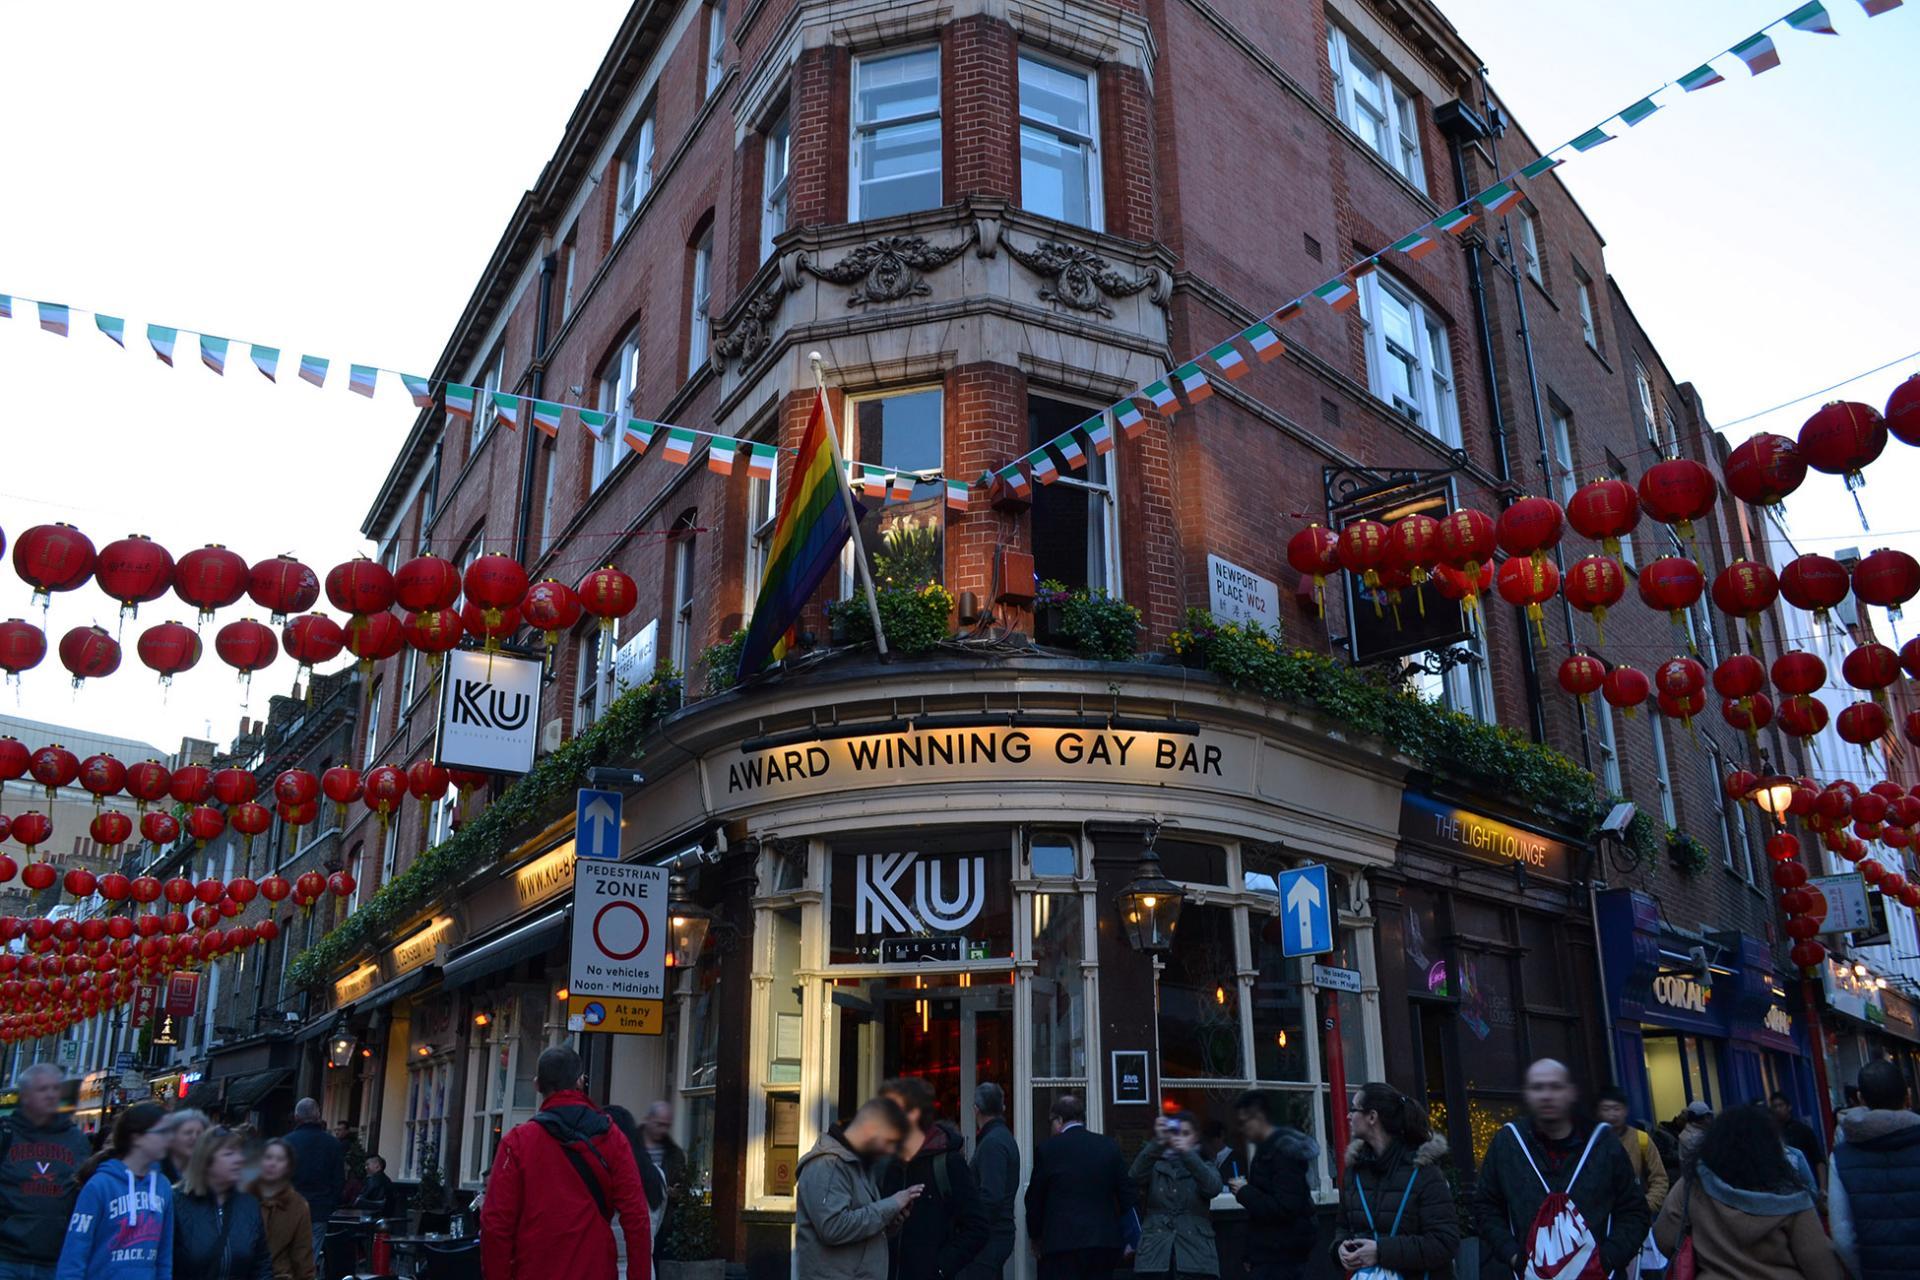 Ku Bar Gay en Londres, Chinatown